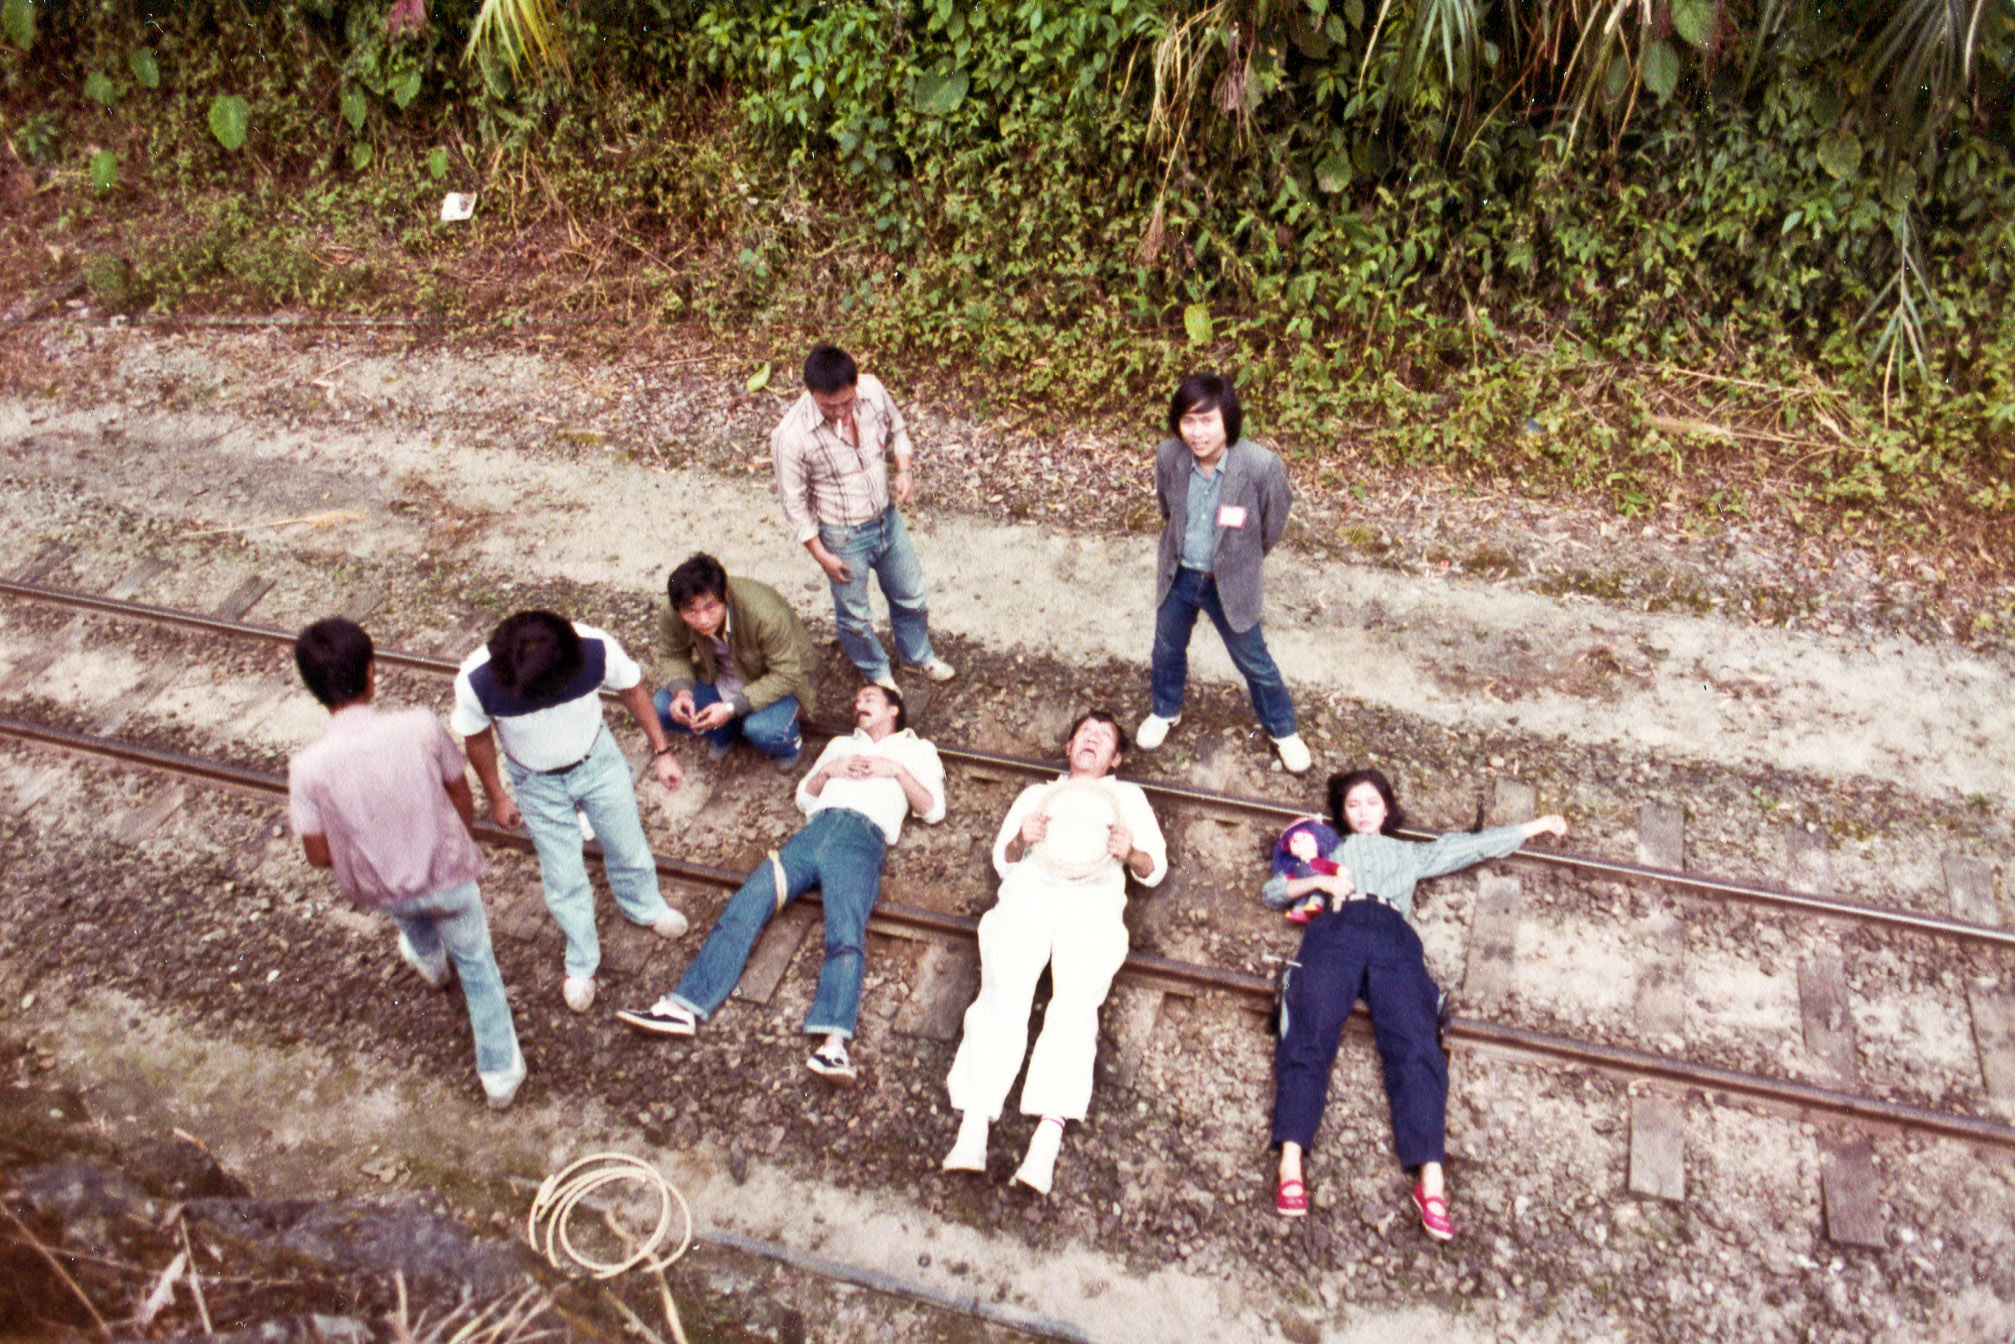 Cherie Chung, James Yi Lui, Tin Nam Tam, and Kwok-Ming Cheung in Xing ji dun tai (1983)